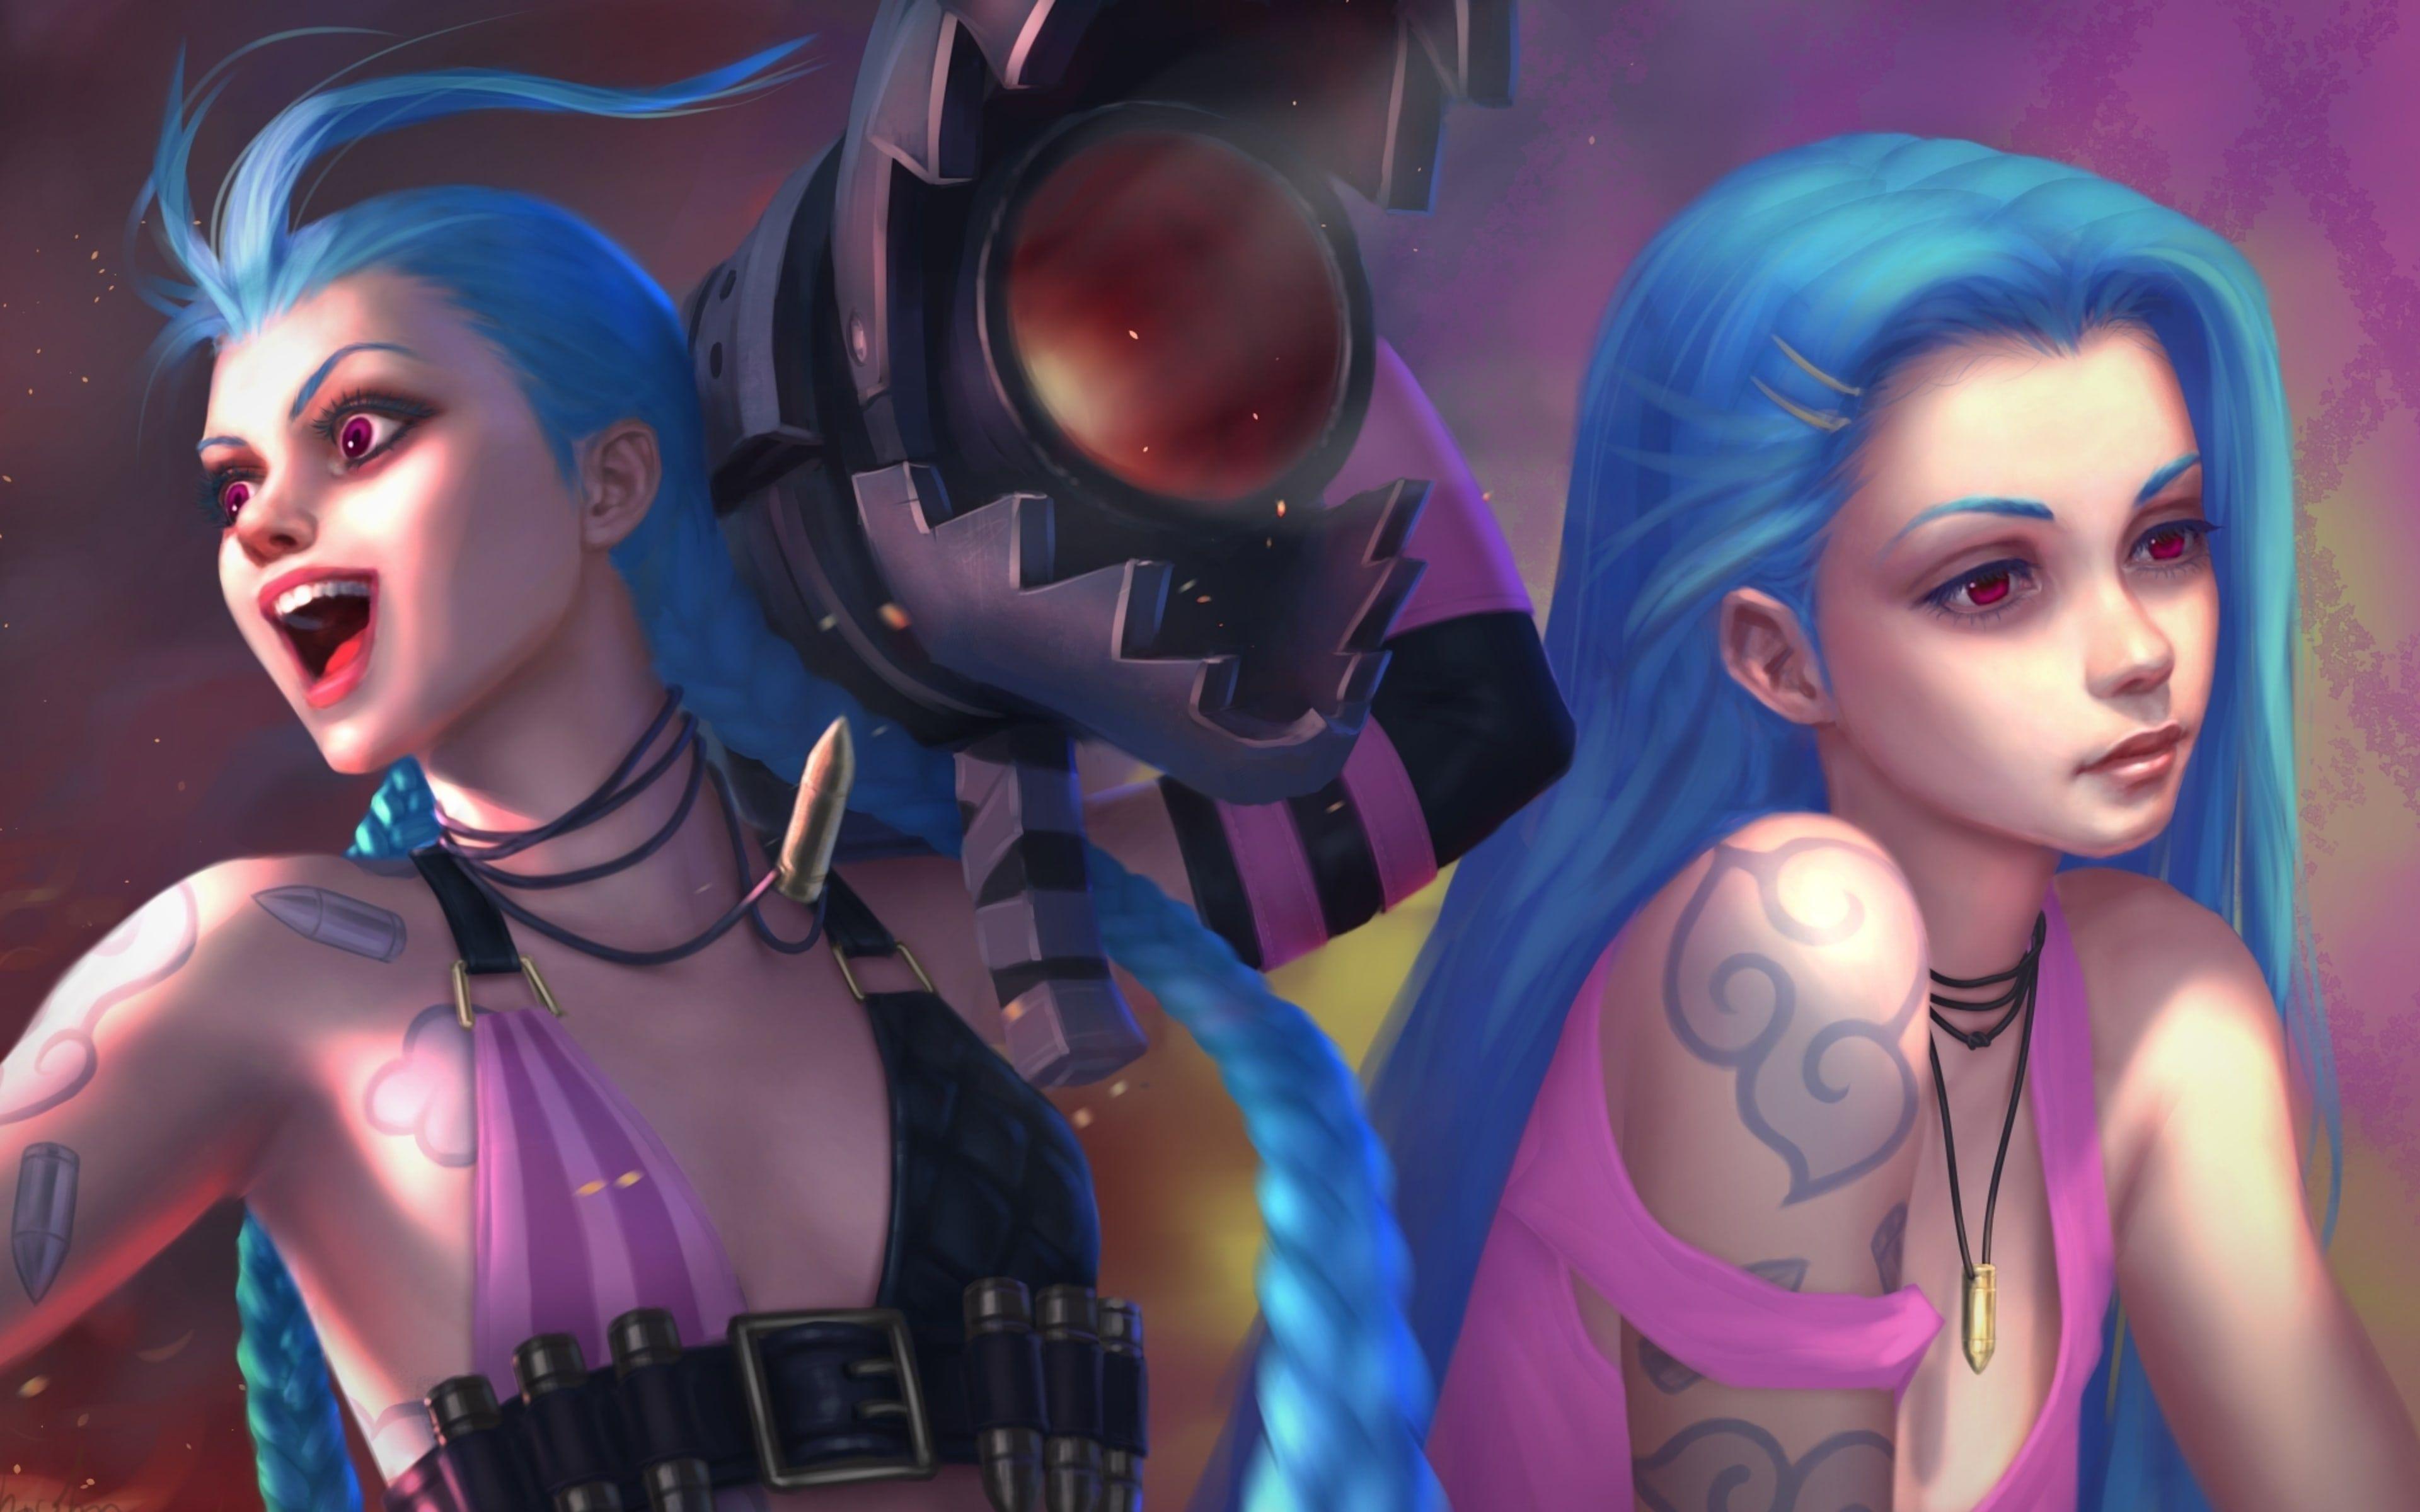 Anime Girl Wallpaper Hd Chubby Jinx Lol Blue Hair Game Girl Gaming Desktop Wallpapers